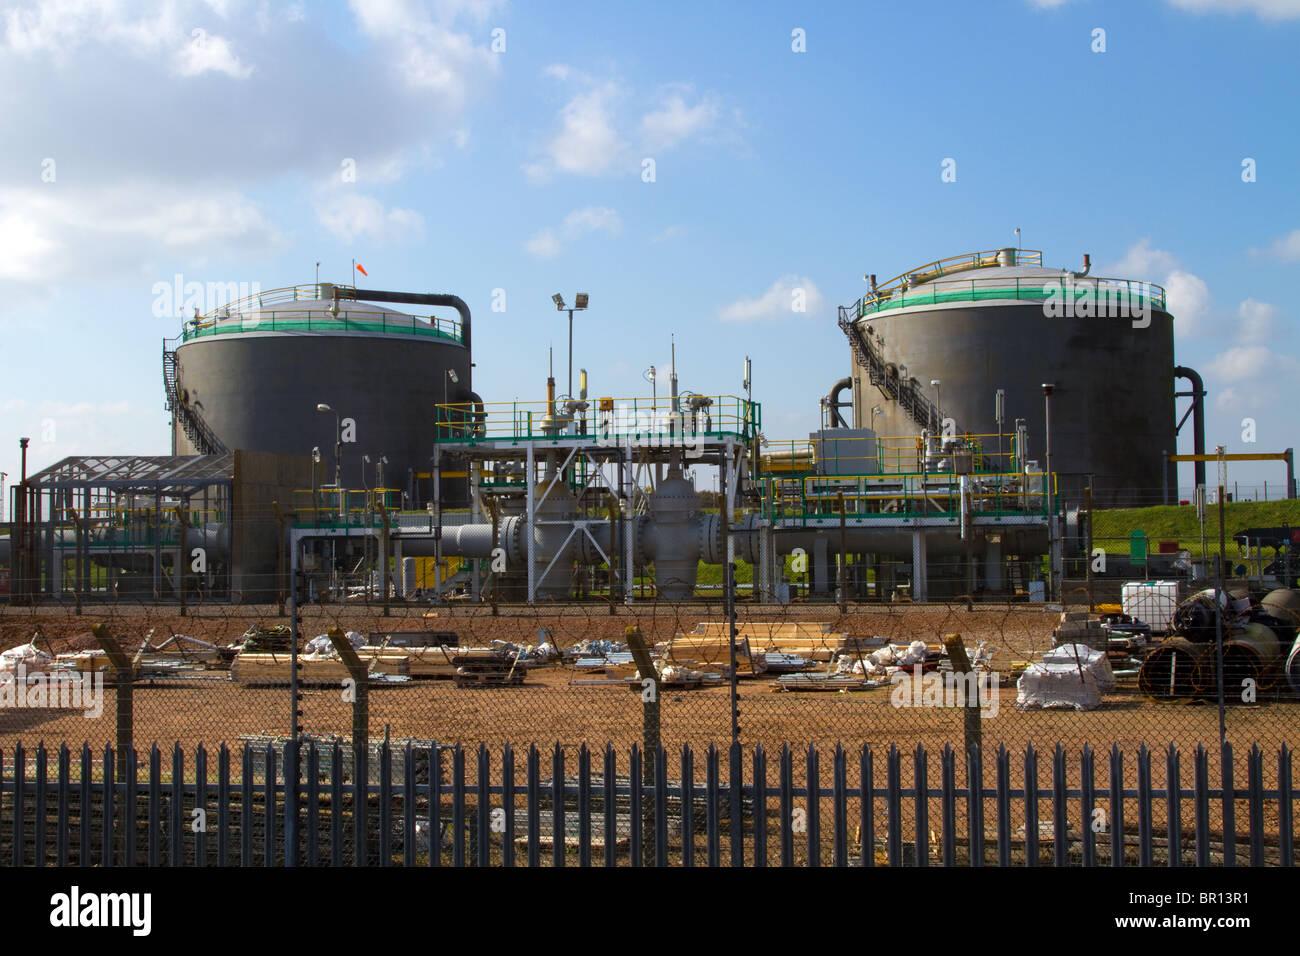 British Petroleum Storage Tanks, Forties Field North sea pipeline base, Cruden Bay, Aberdeenshire  Scotland, UK - Stock Image